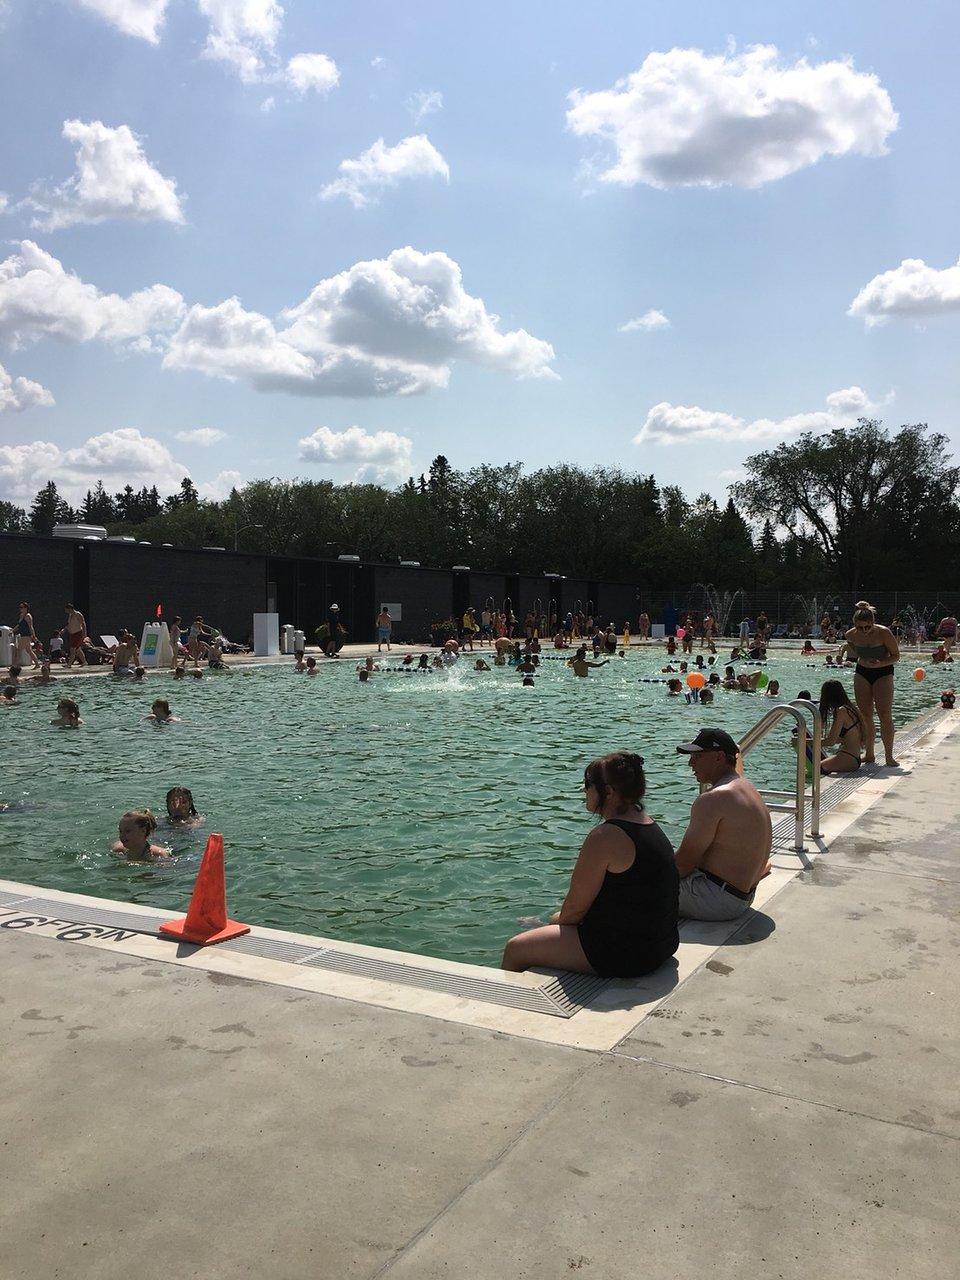 Borden natural swimming pool edmonton all you need to - University of alberta swimming pool ...